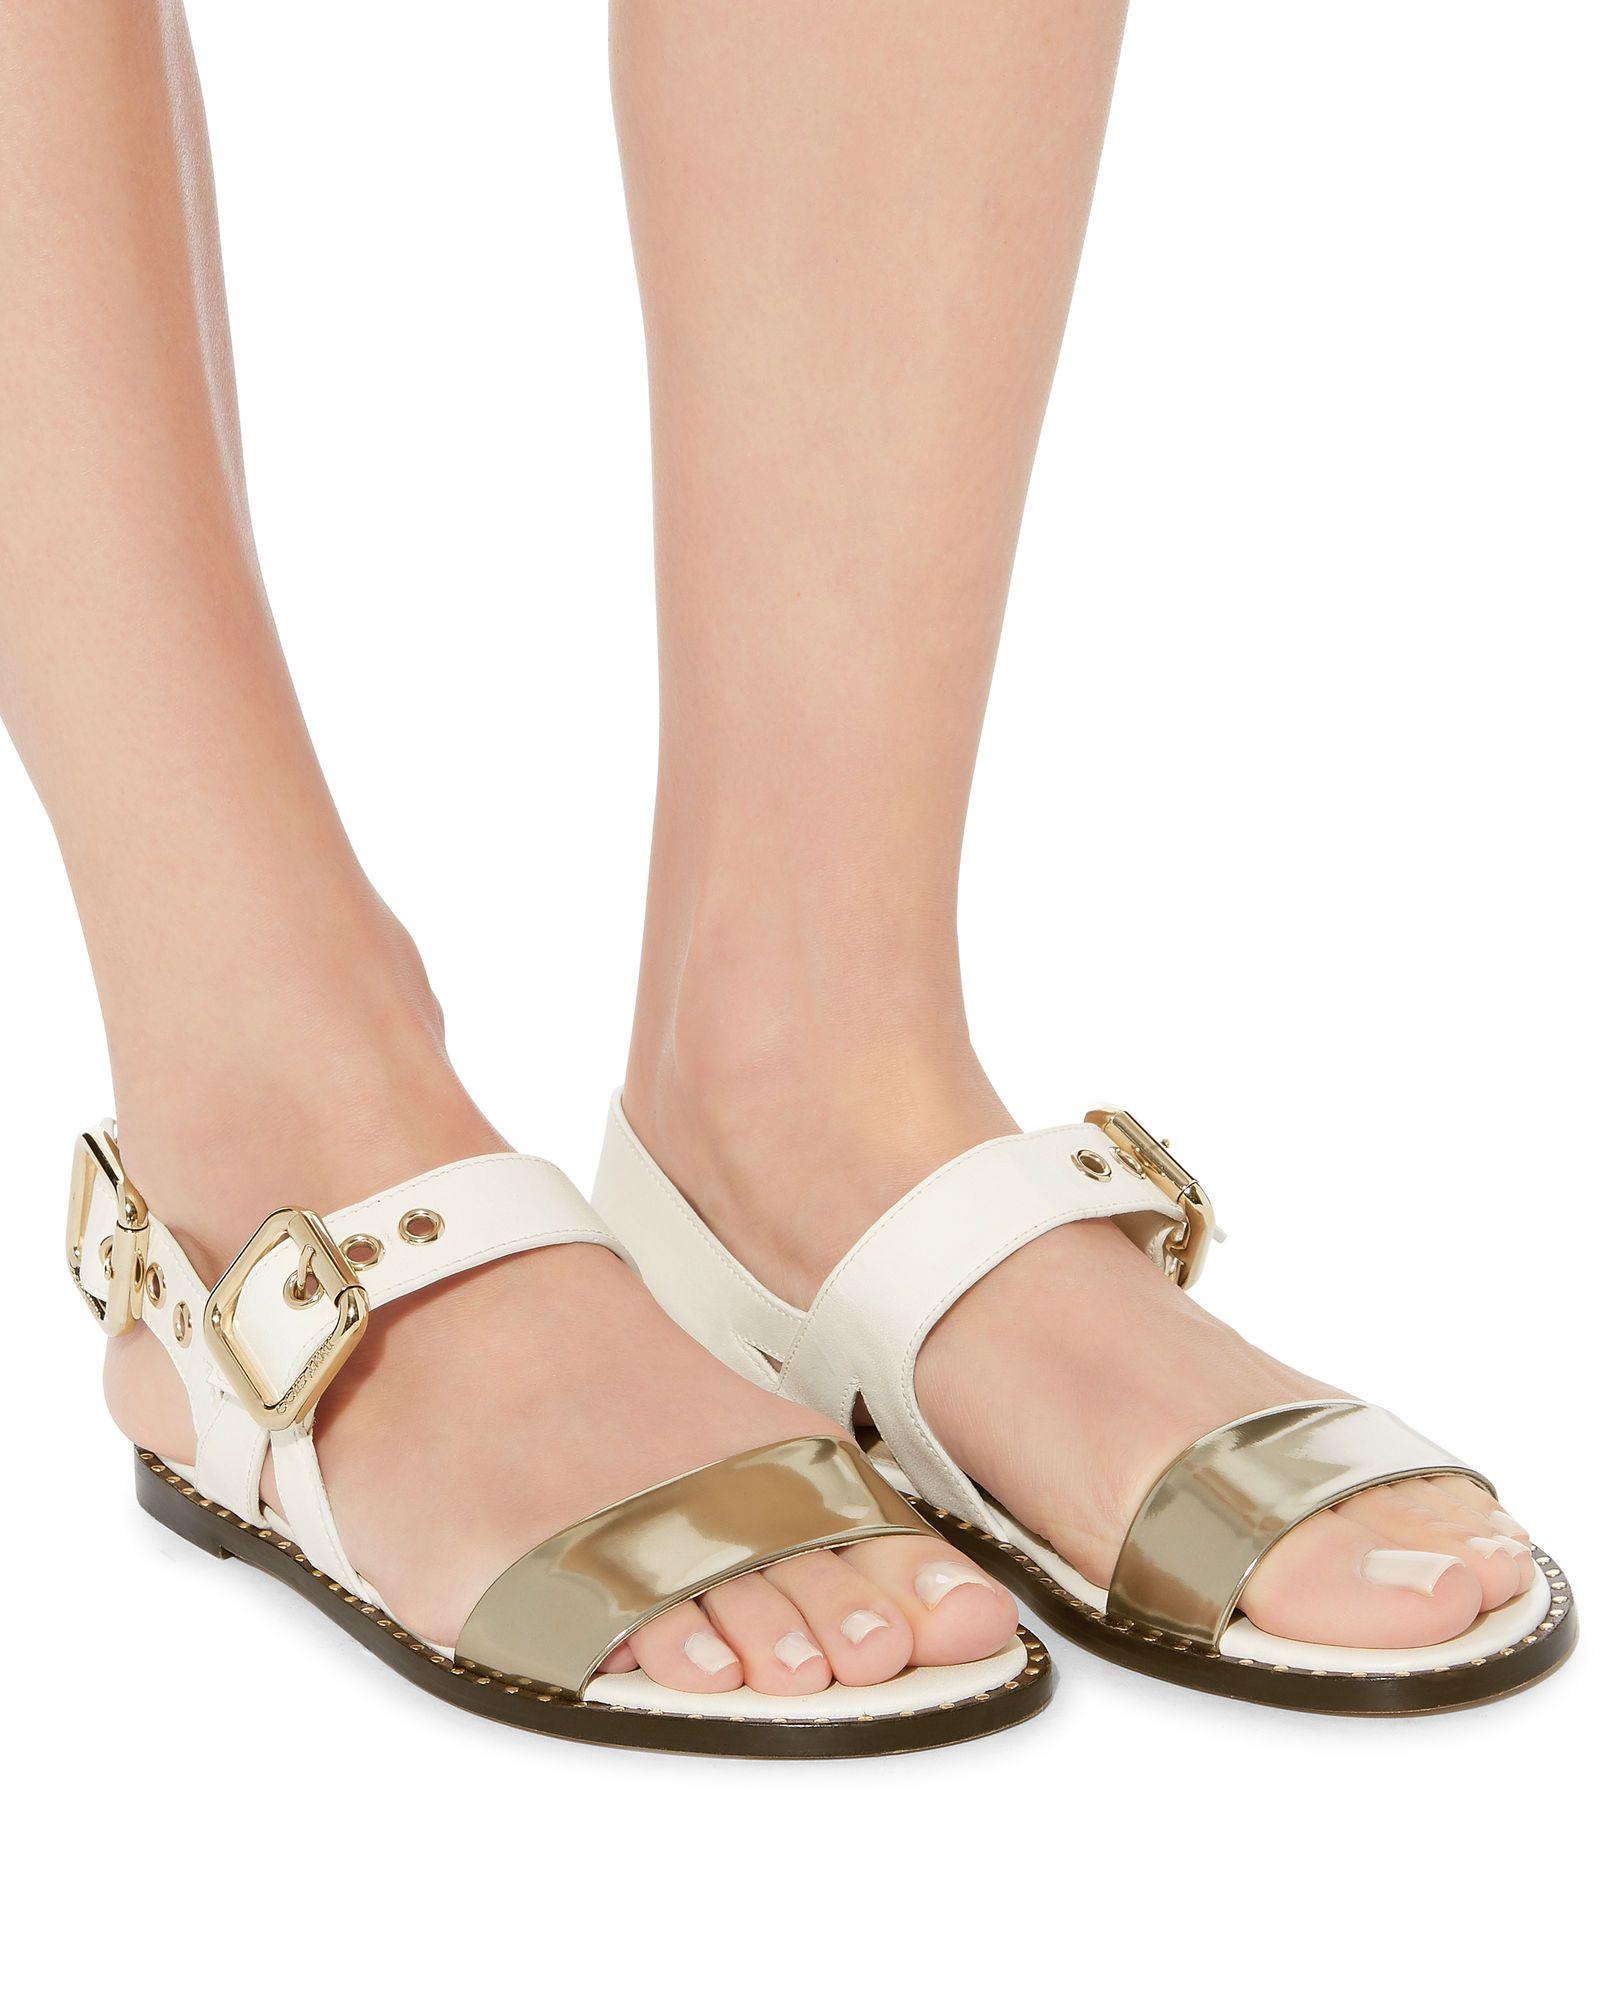 47e66821dcf Astrid Buckle Sandals